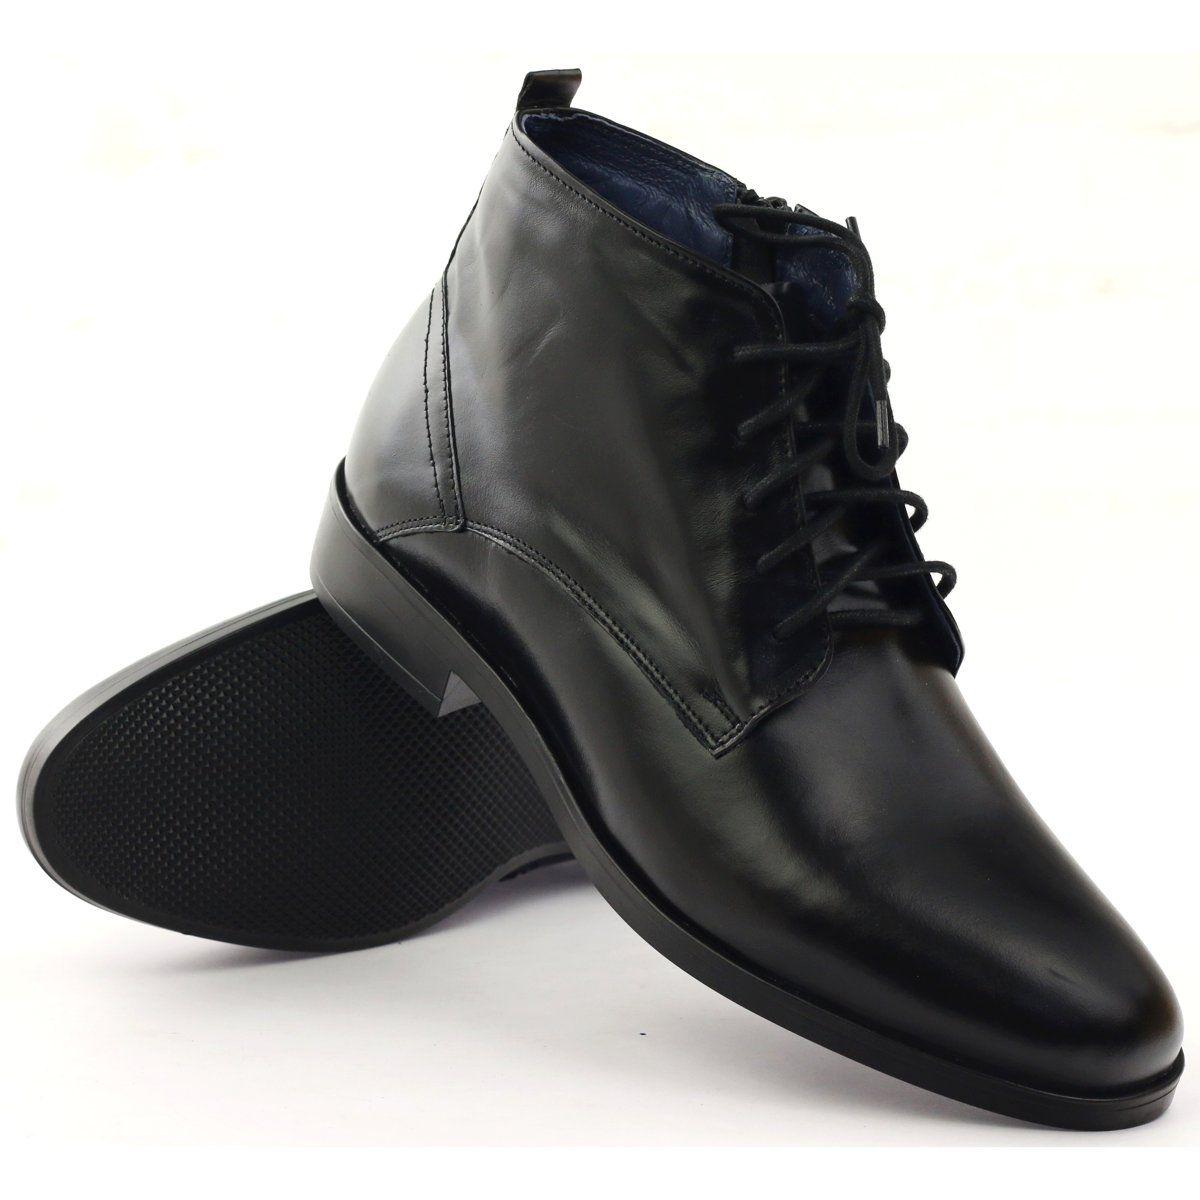 Botki Zimowe Na Suwak Nikopol 663 Czarne Boots Men Dress Shoes Men Winter Boots